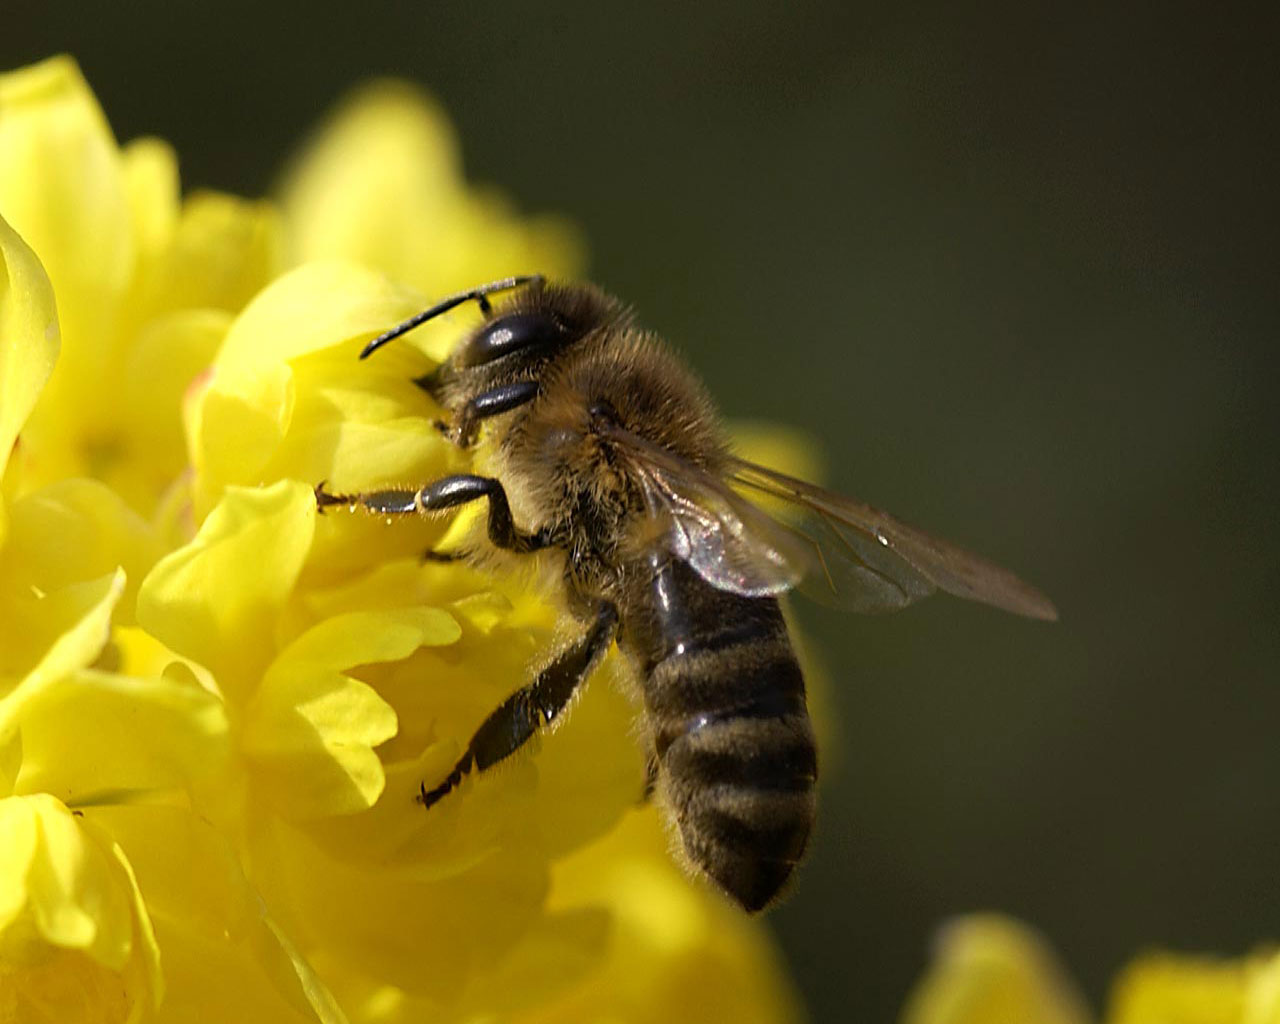 _ Башкирская бортевая (бурзянская) пчела. Фотография, http://animalwild.net/.